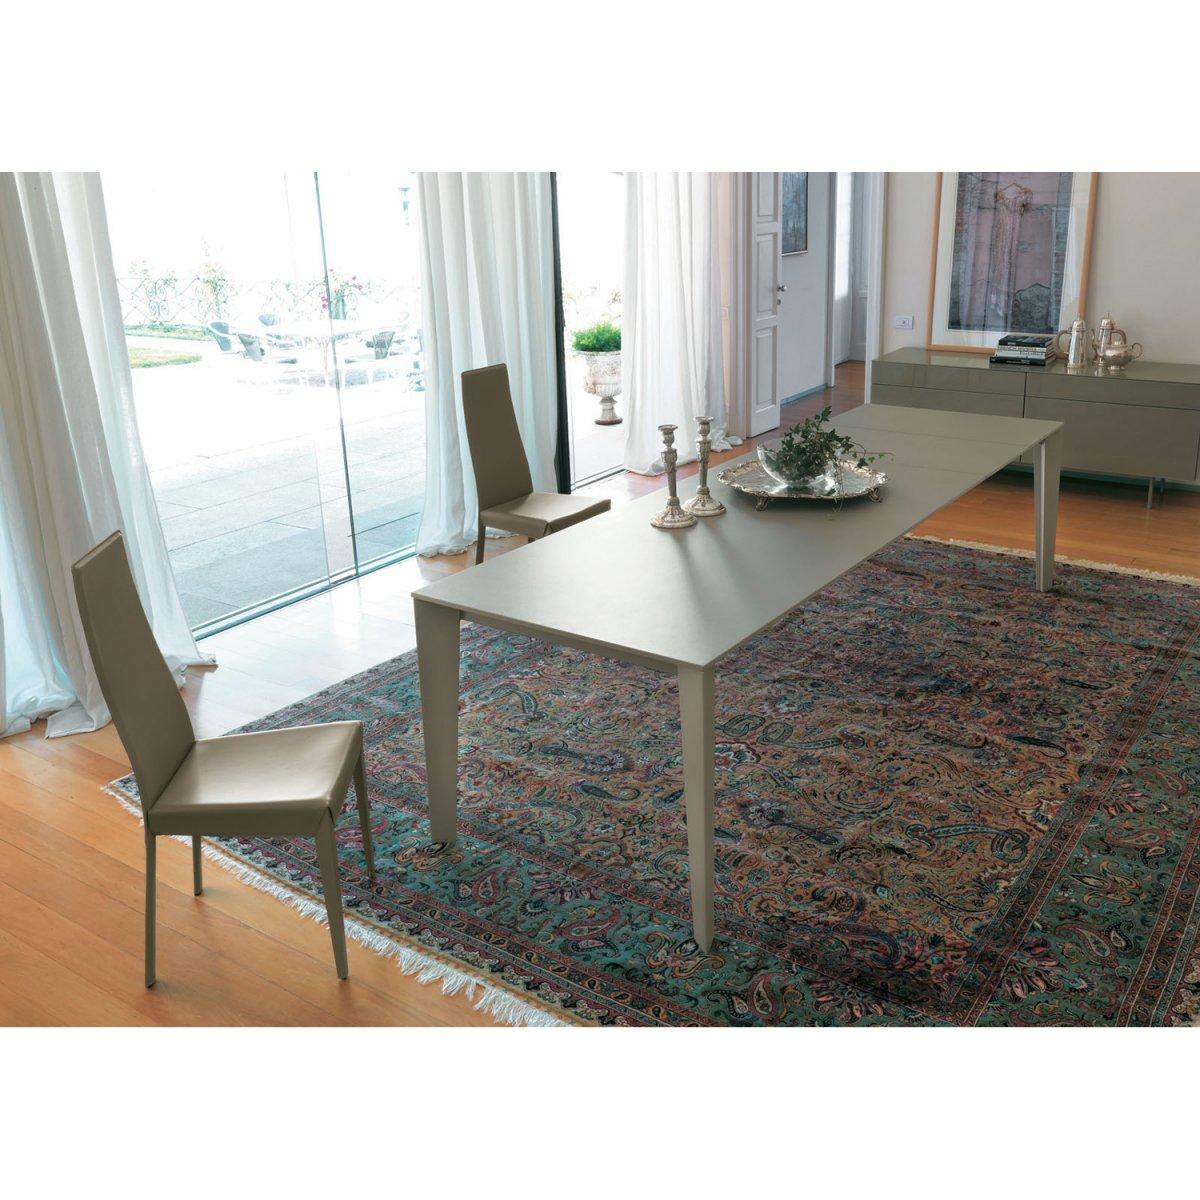 Bontempi casa tavolo cruz allungabile 120x80 melaminico for Tavolo 120x80